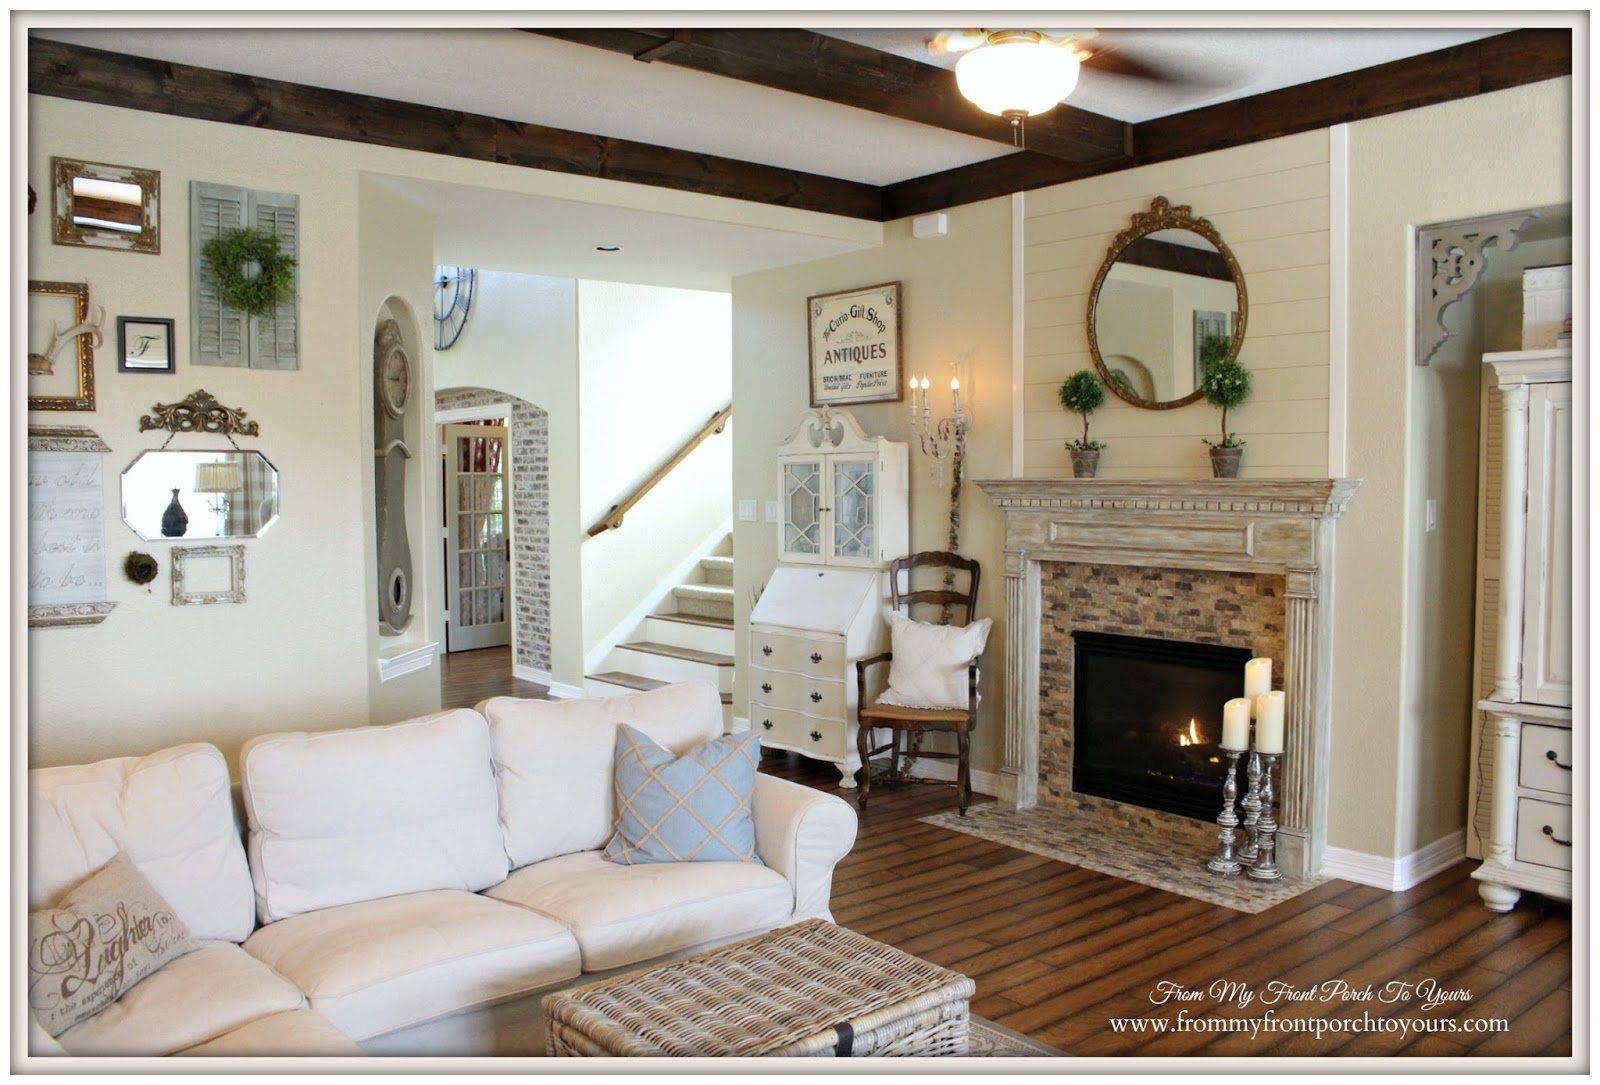 35 Rustic Farmhouse Interior Design Ideas that will